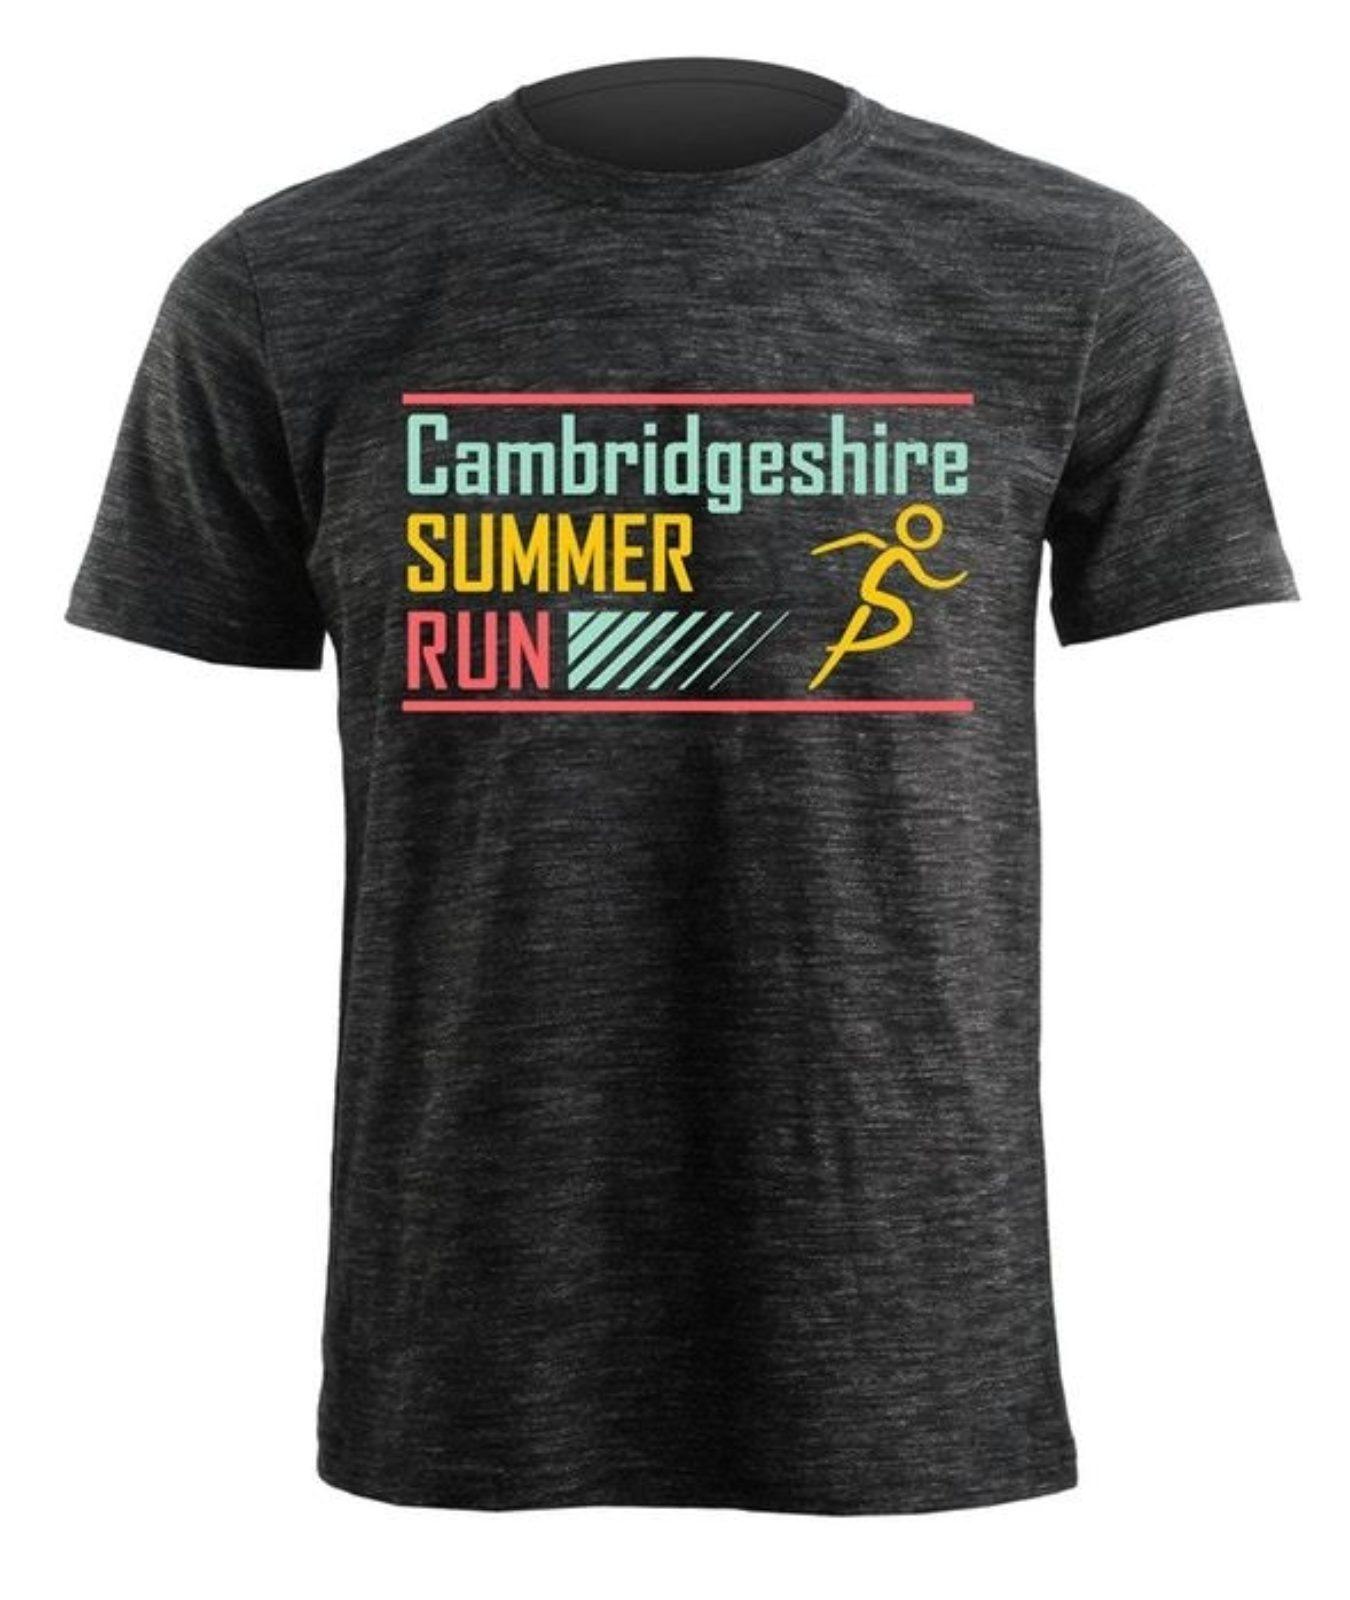 Summer Run T